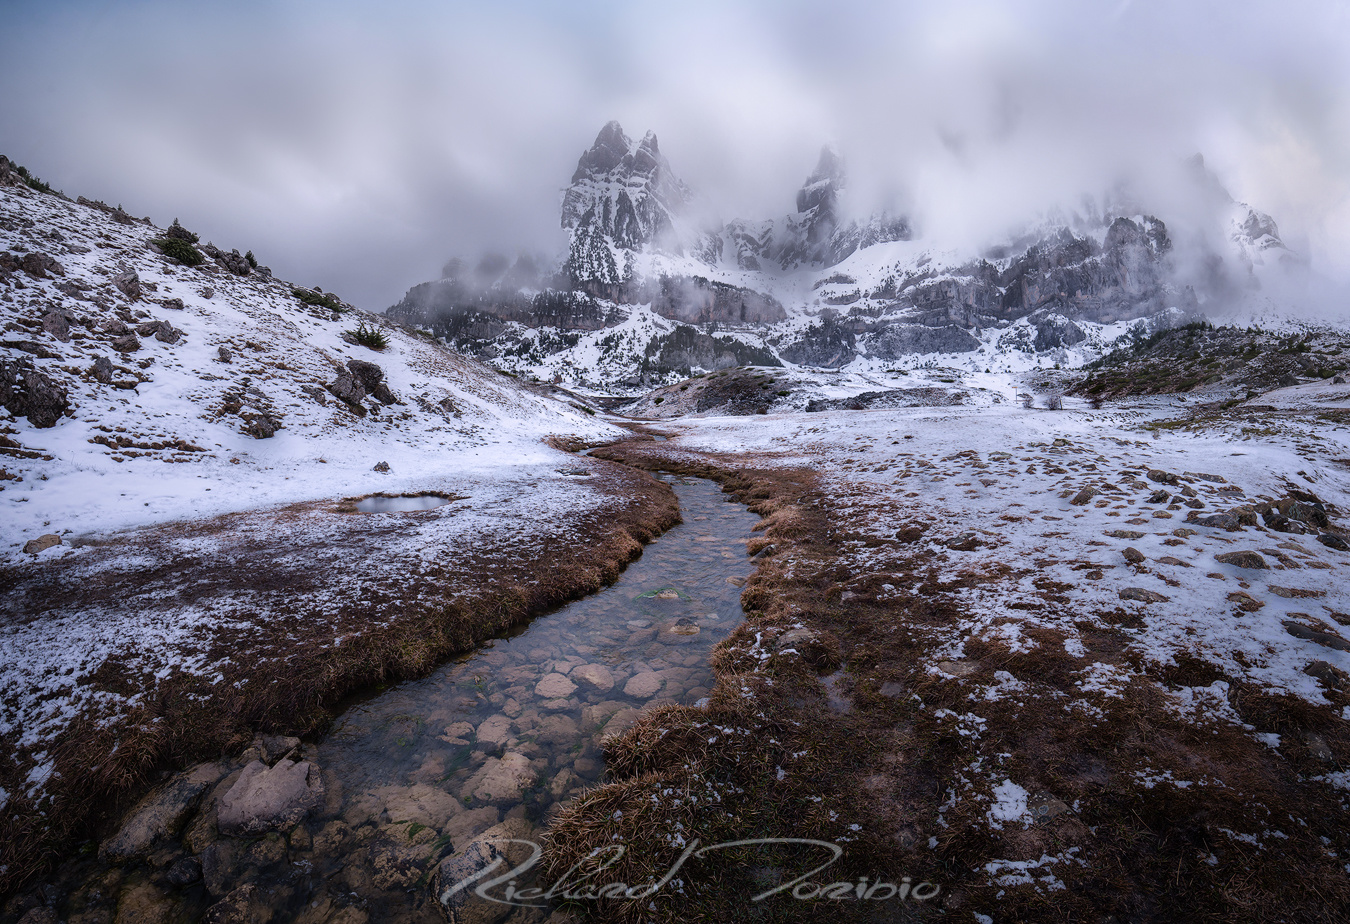 White Peaks by richard toribio casares